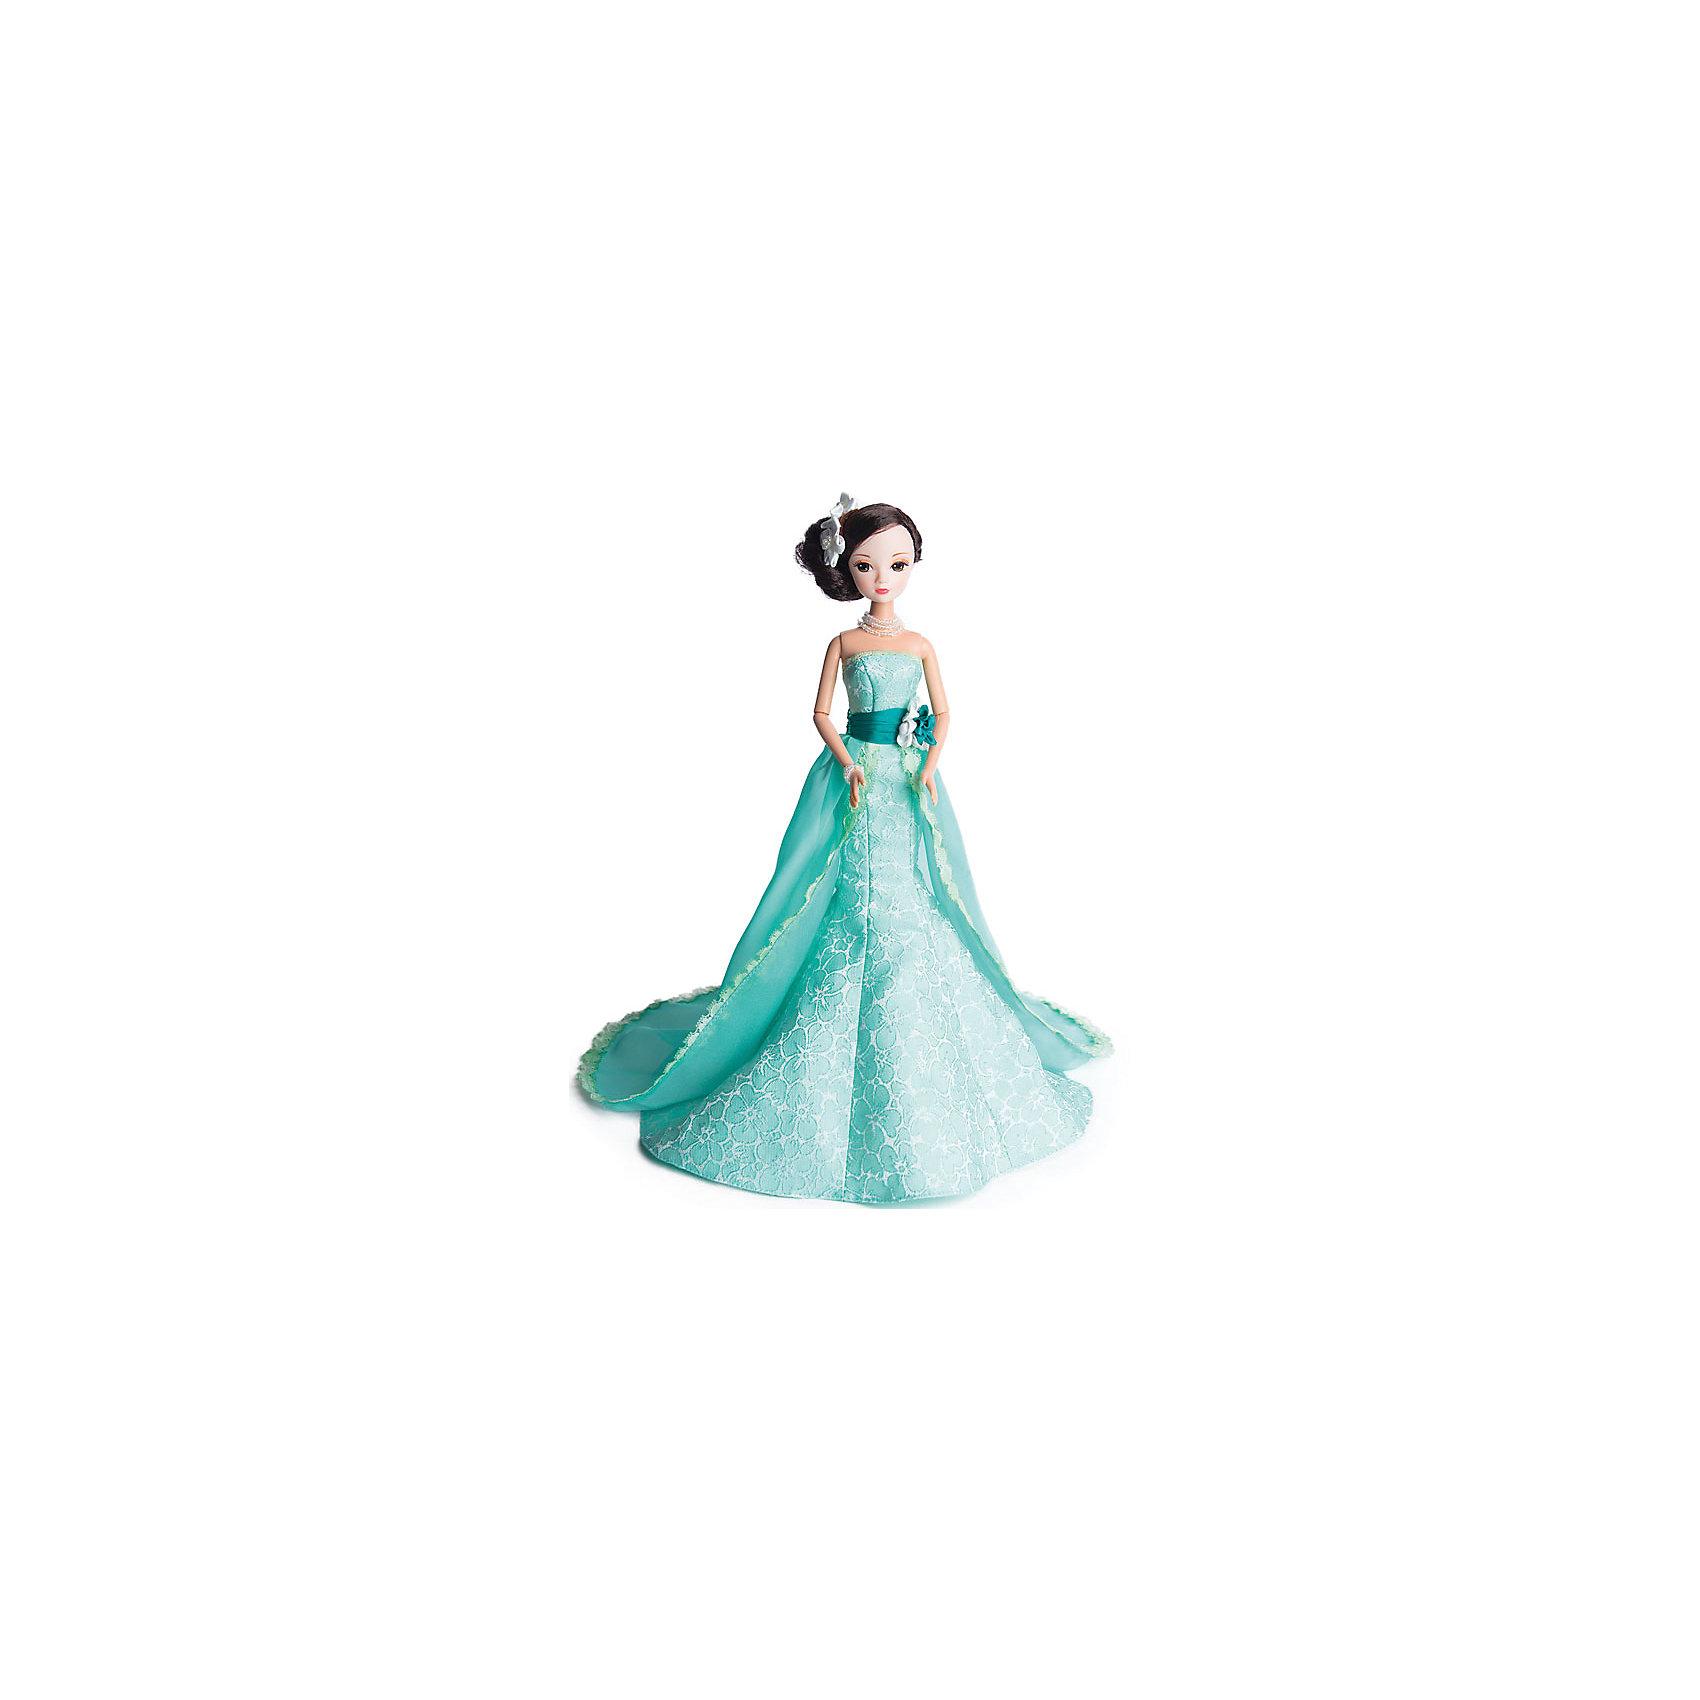 Кукла Жасмин, серия Золотая коллекция, Sonya Rose<br><br>Ширина мм: 230<br>Глубина мм: 320<br>Высота мм: 70<br>Вес г: 366<br>Возраст от месяцев: 36<br>Возраст до месяцев: 2147483647<br>Пол: Женский<br>Возраст: Детский<br>SKU: 5079165